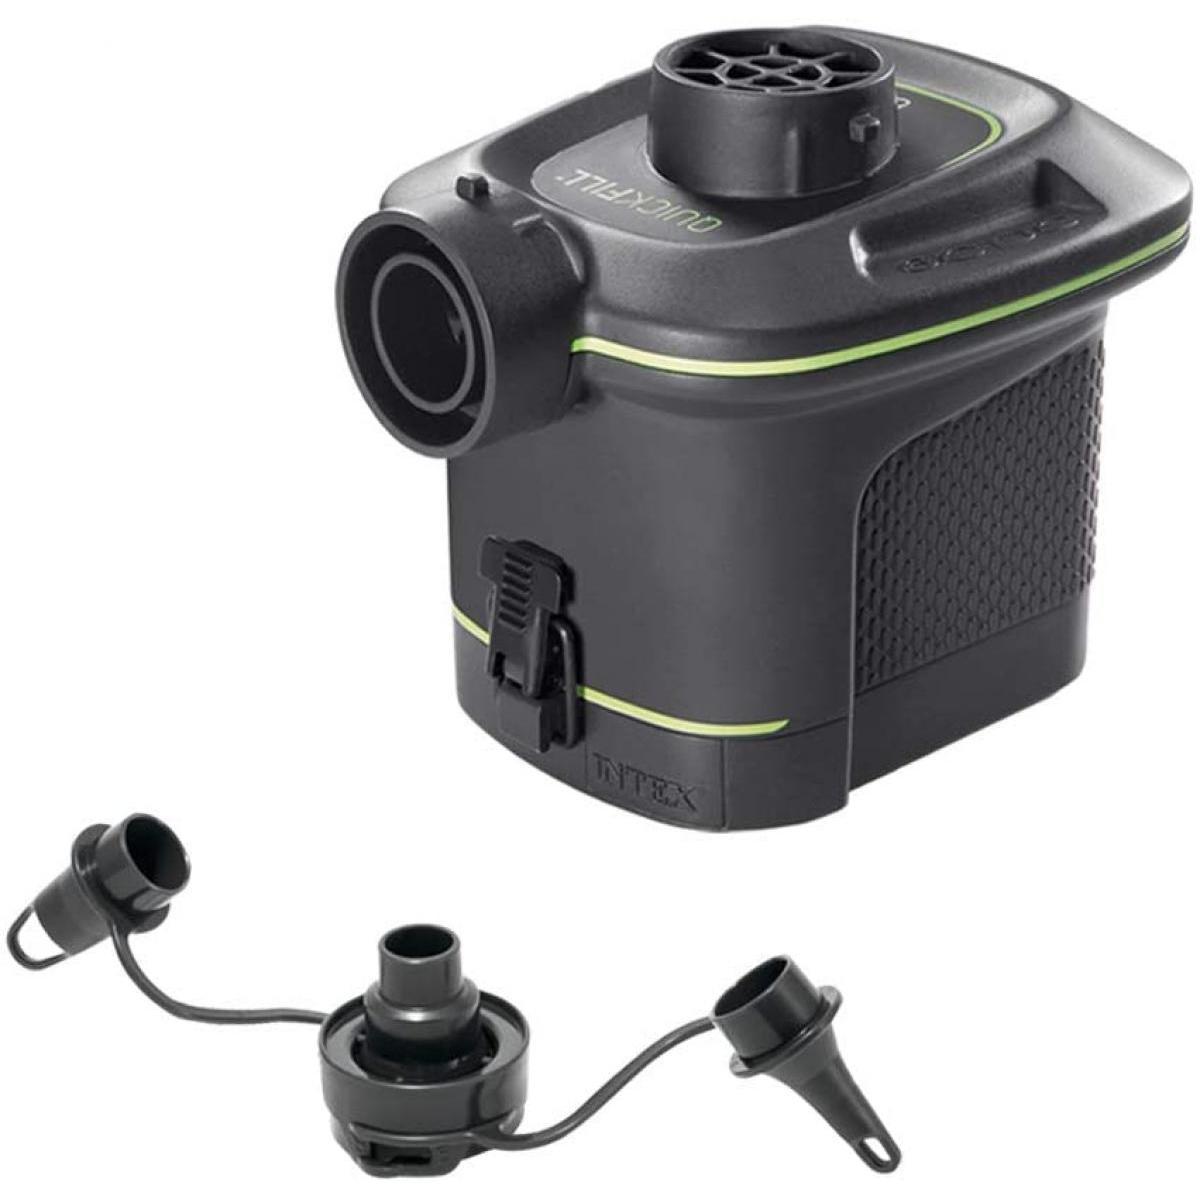 INTEX インテックス 空気入れ 注目ブランド ポンプ バッテリーポンプ 電池式 電動空気入れ 66638 電動 出色 自動空気入れ プール用 日本正規品